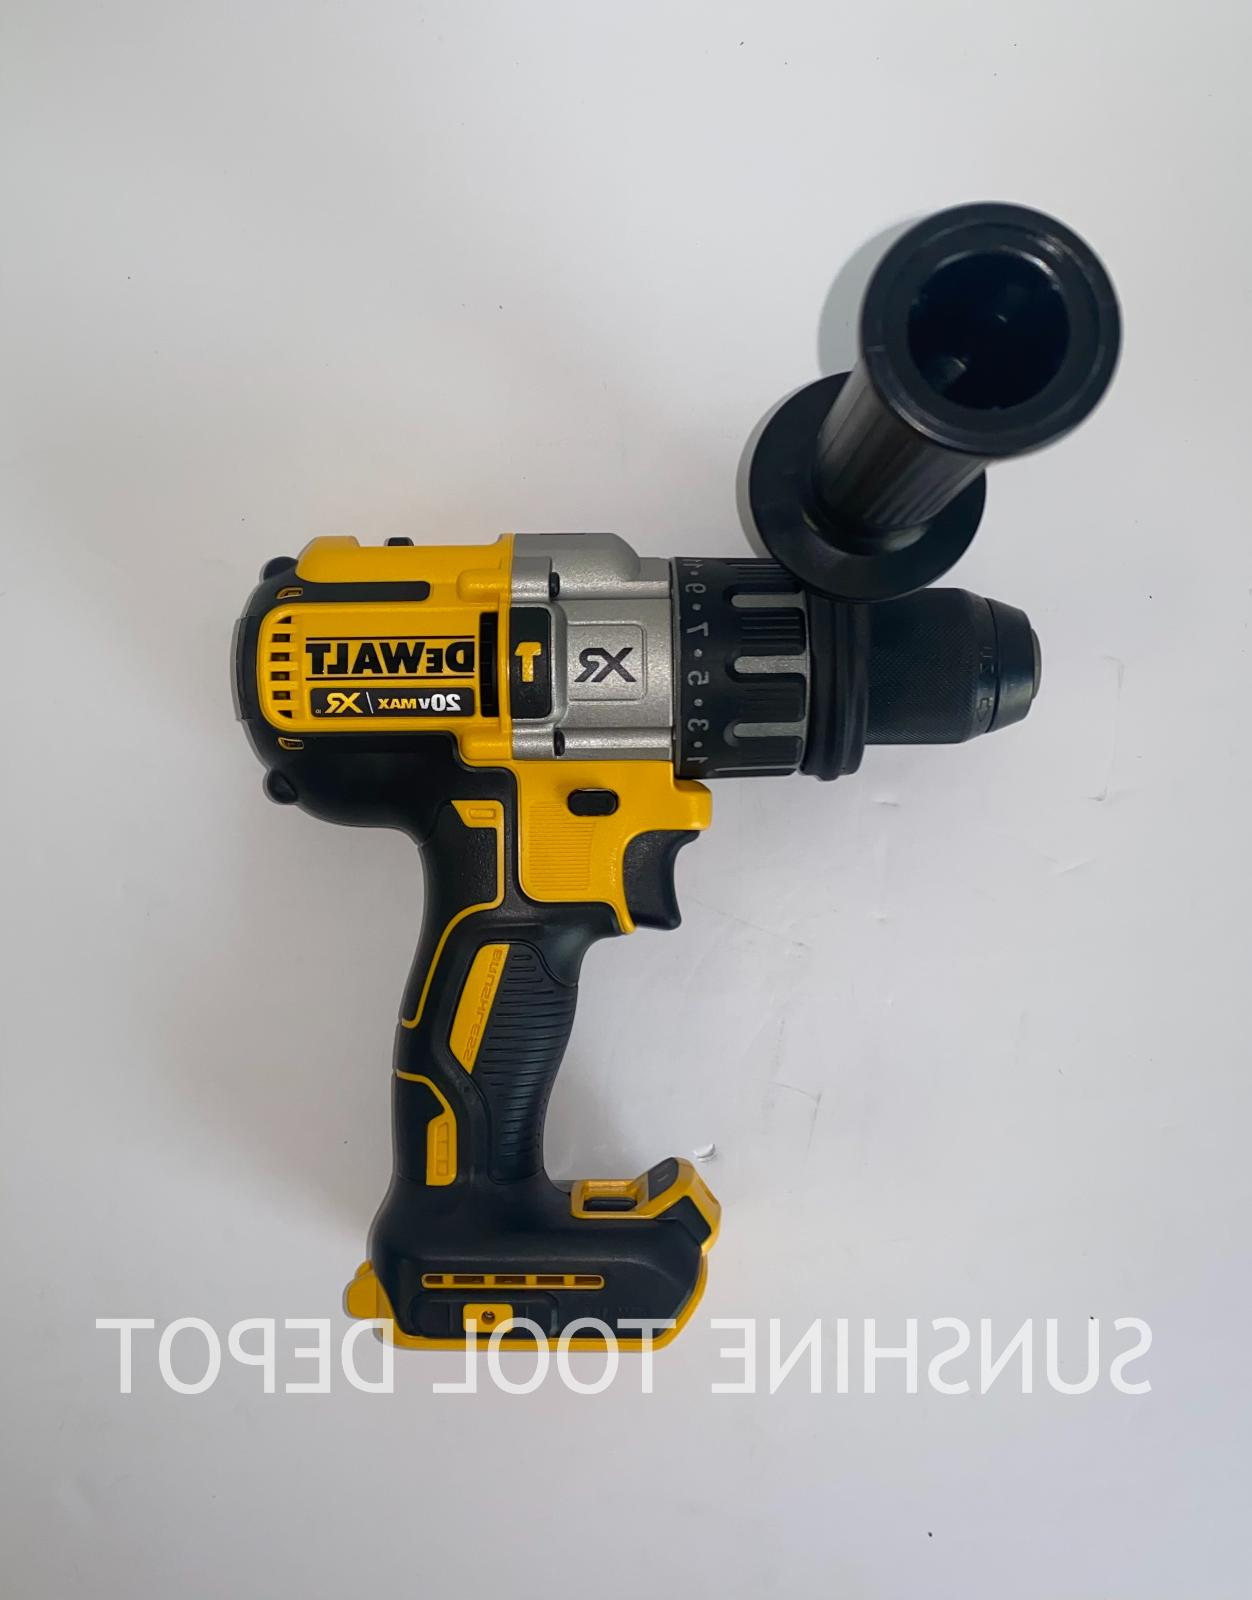 DeWalt 20V XR Hammer